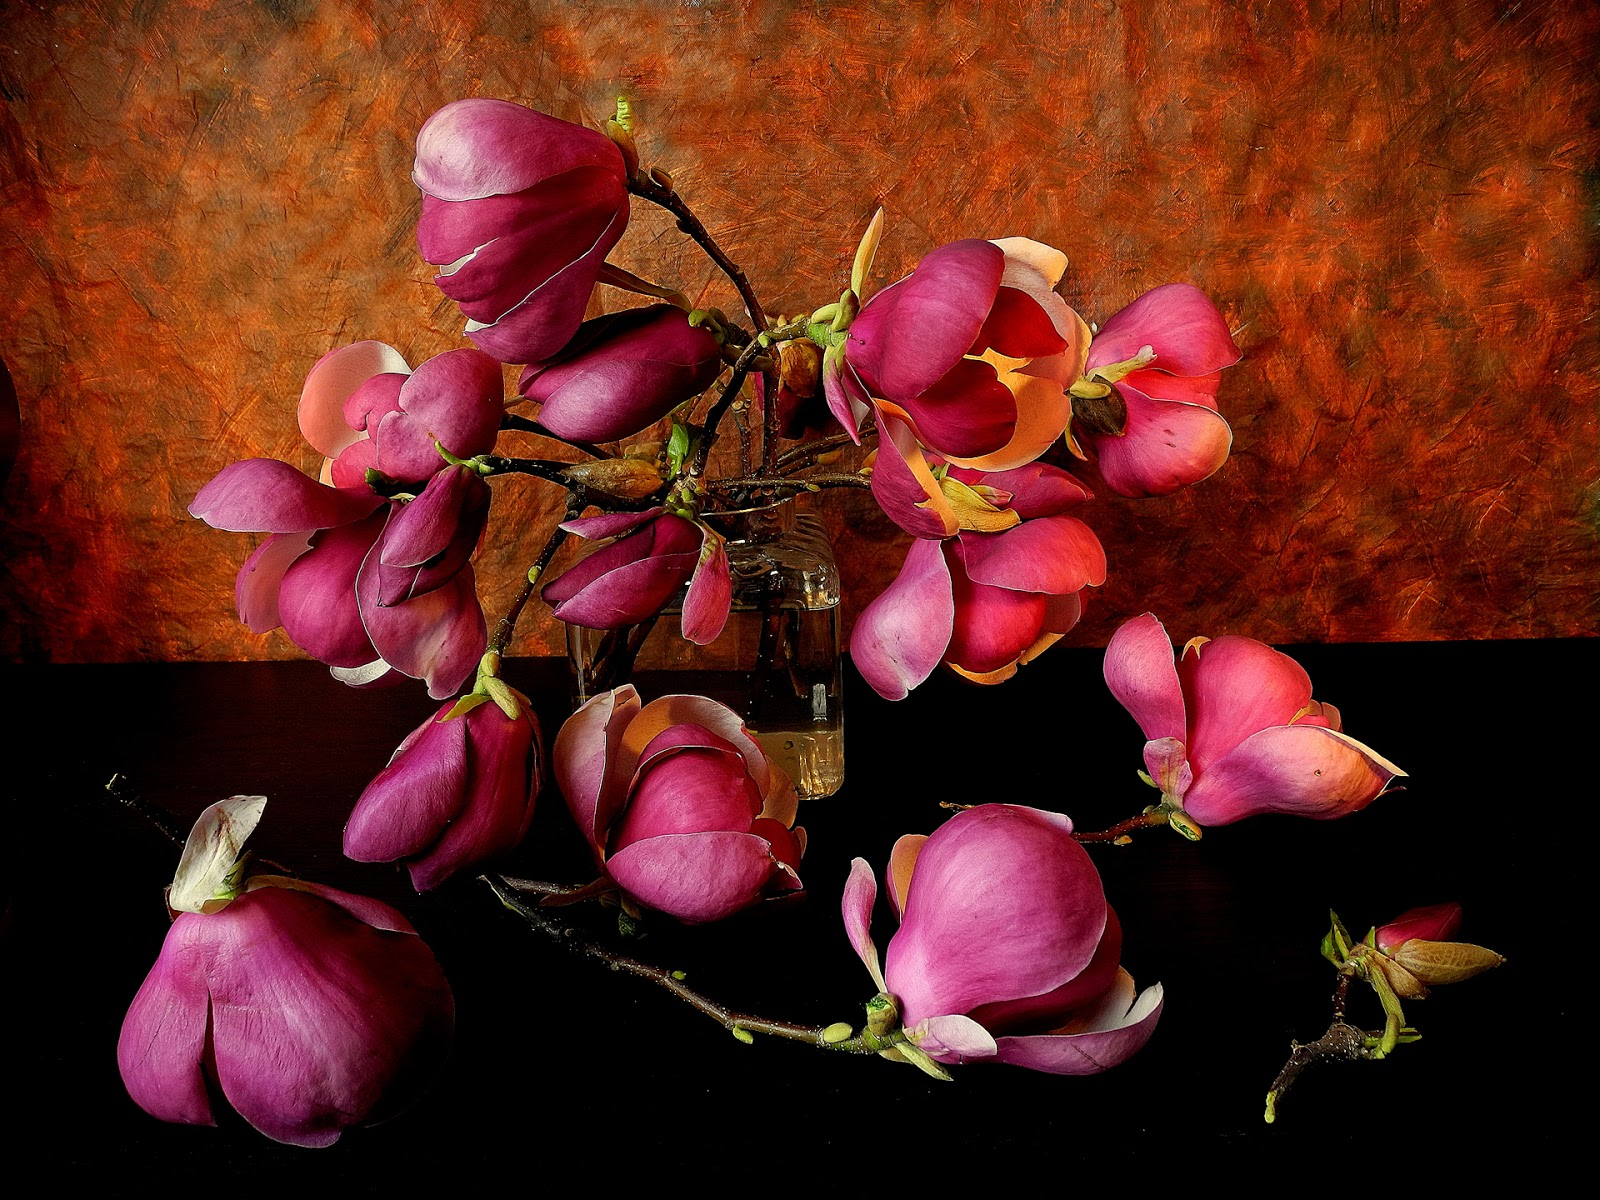 arreglos florales naturales Decorar tu casa es facilisimo com - Fotos De Arreglos Flores Naturales